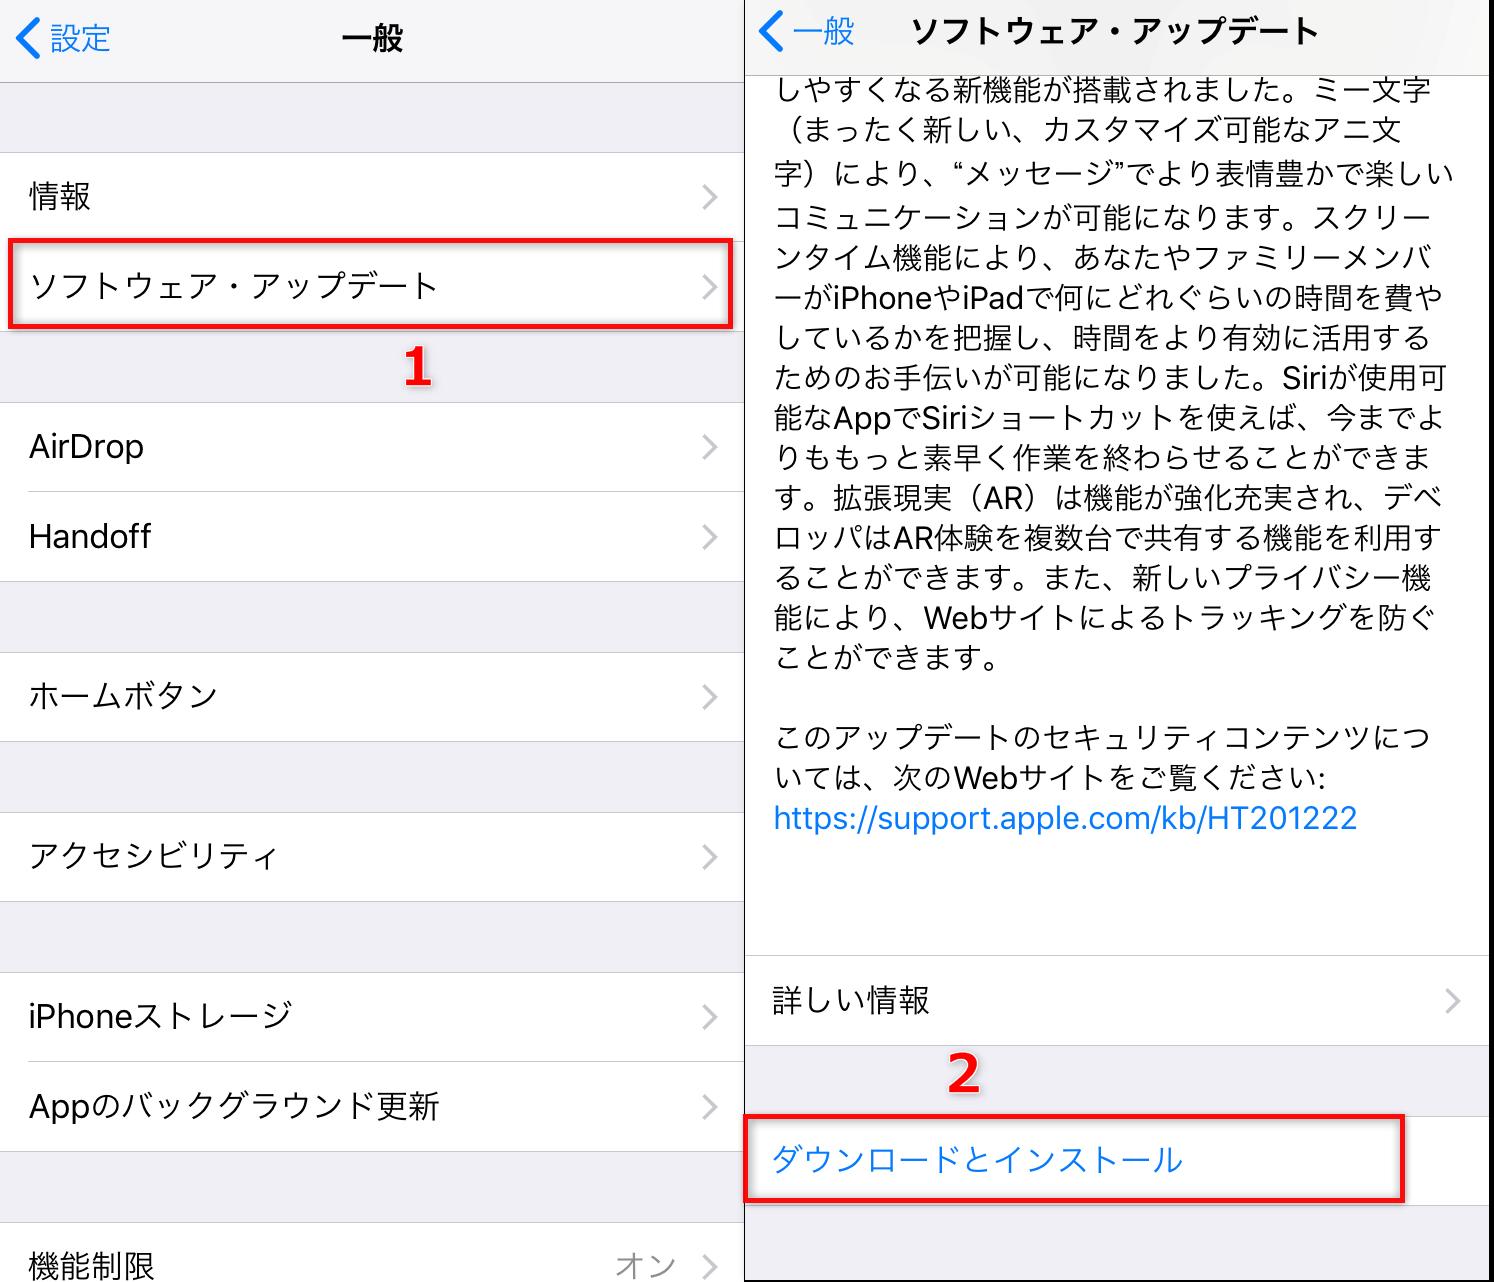 iPhone/iPad/iPod touchをiOS 12にアップデートする方法